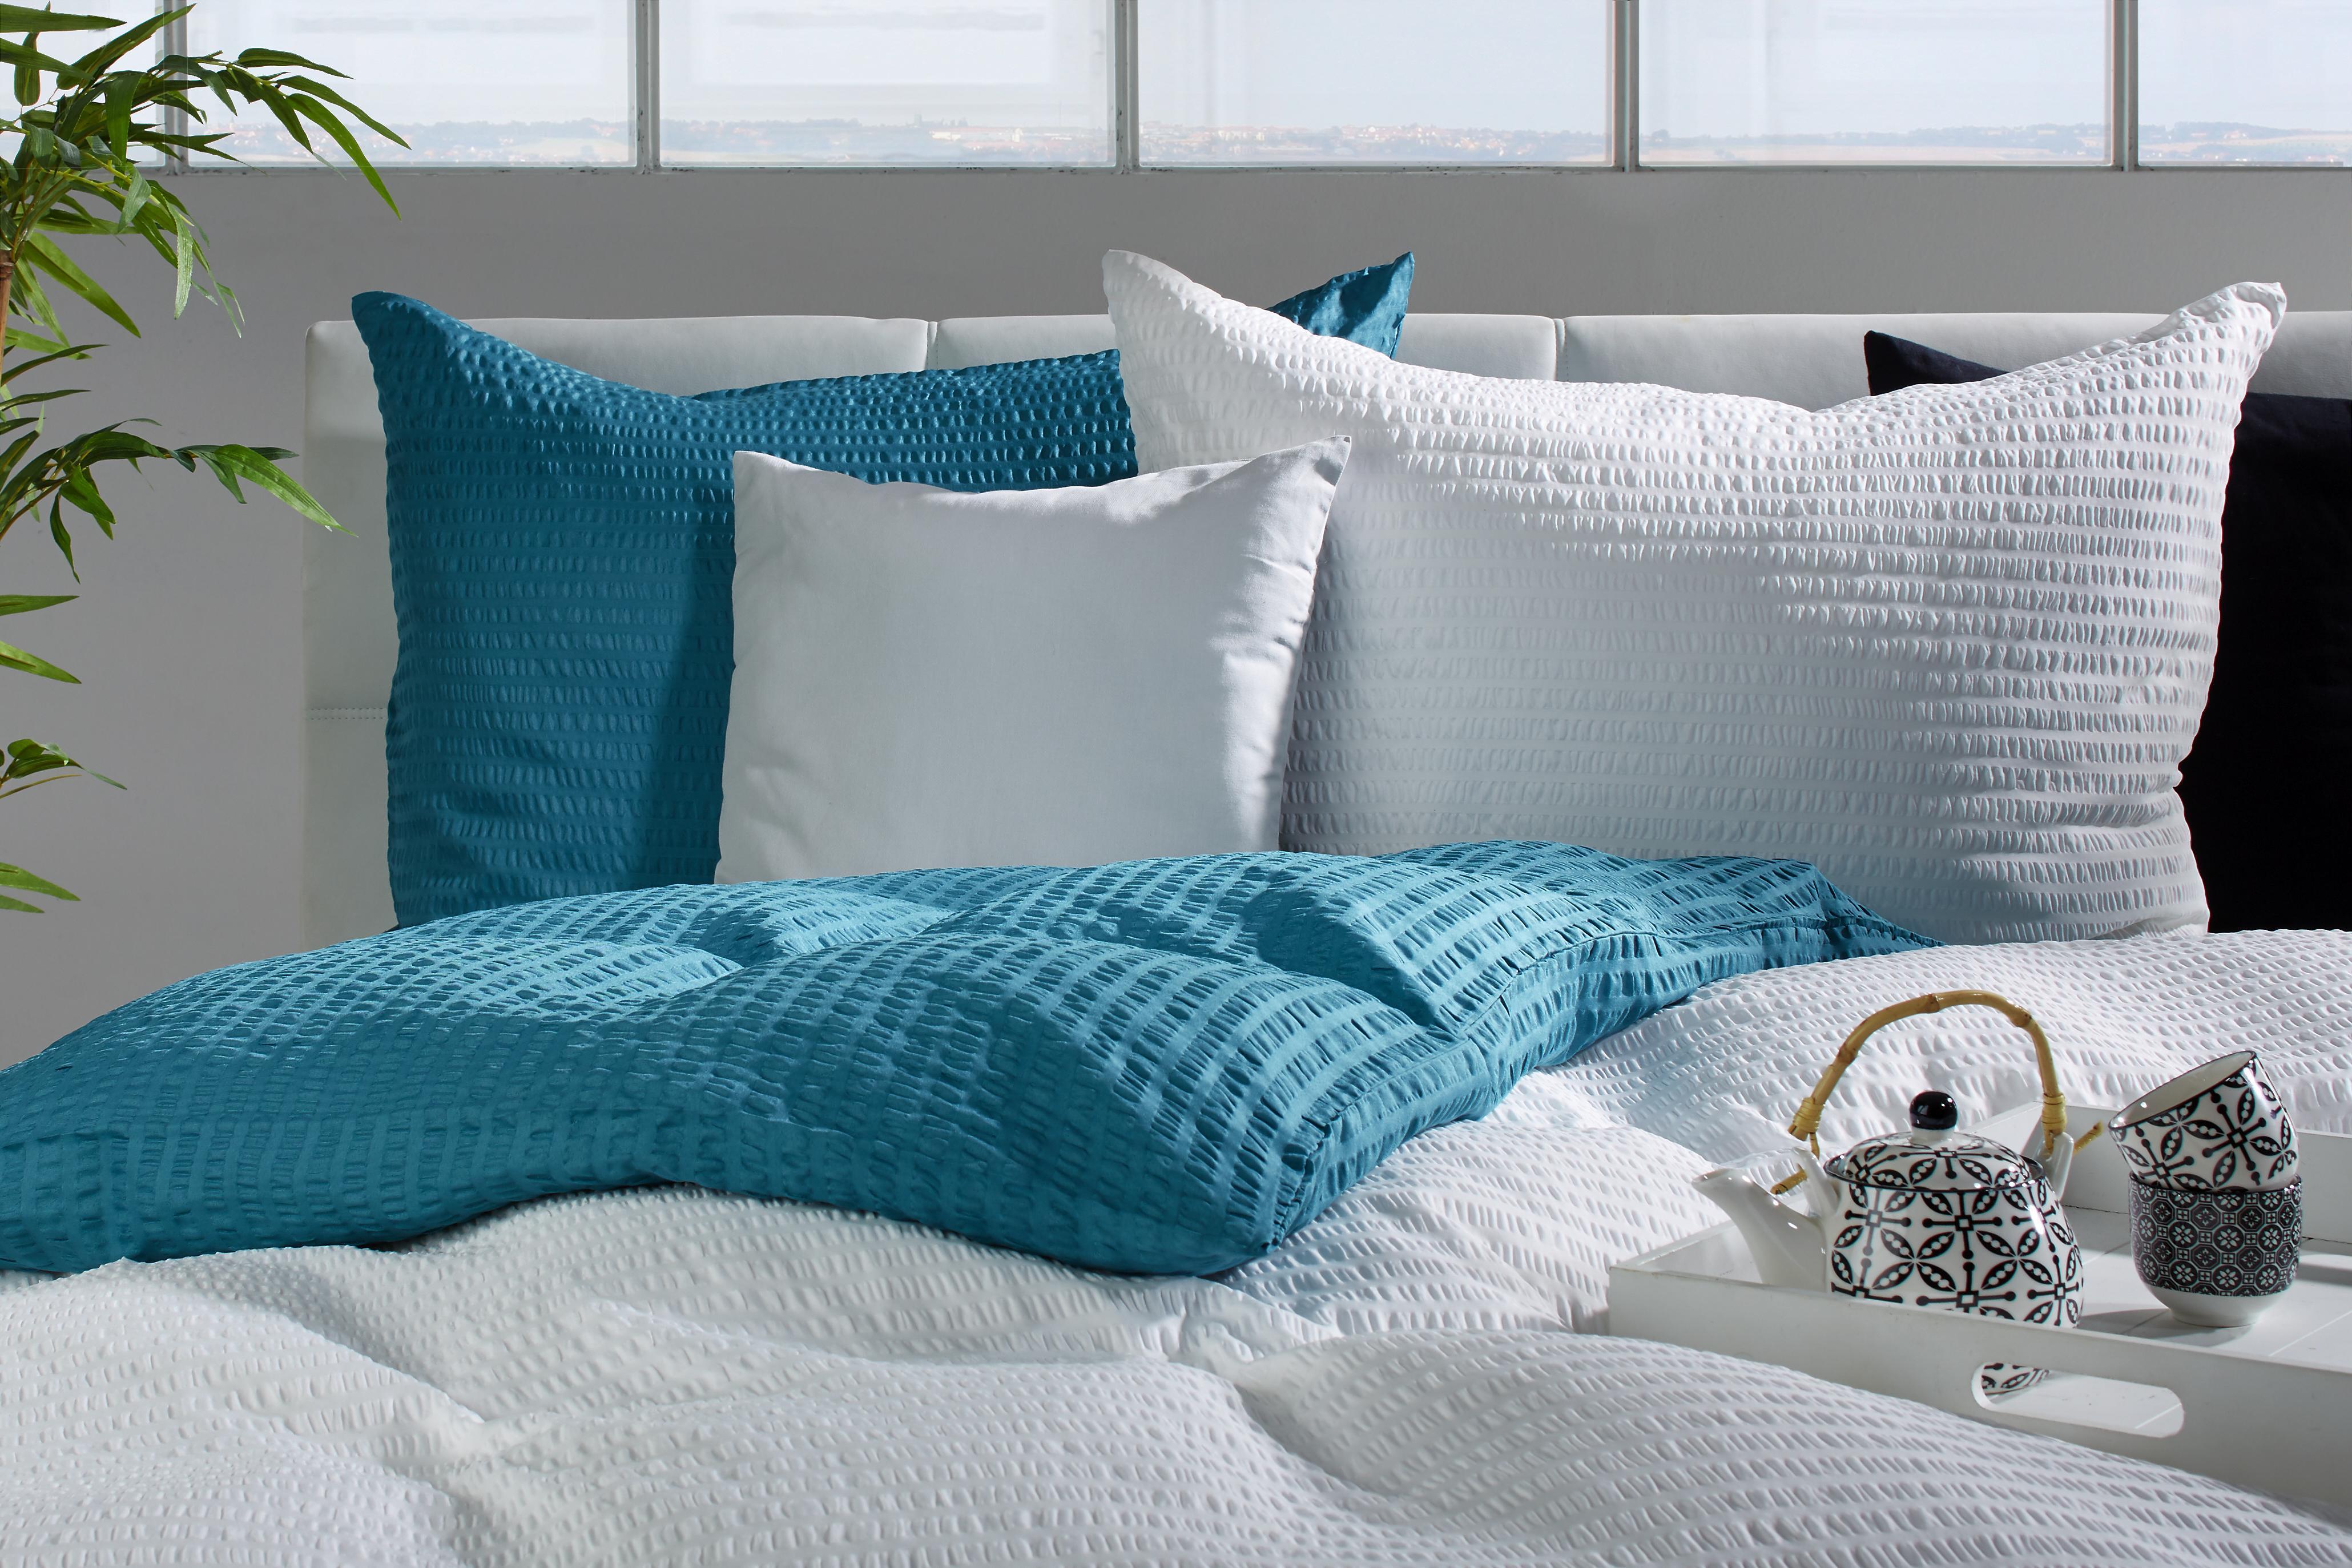 agynemuhuzat-brigitte-feher-konvencionalis-textil-moemax-modern-living.jpg 49da2aed71